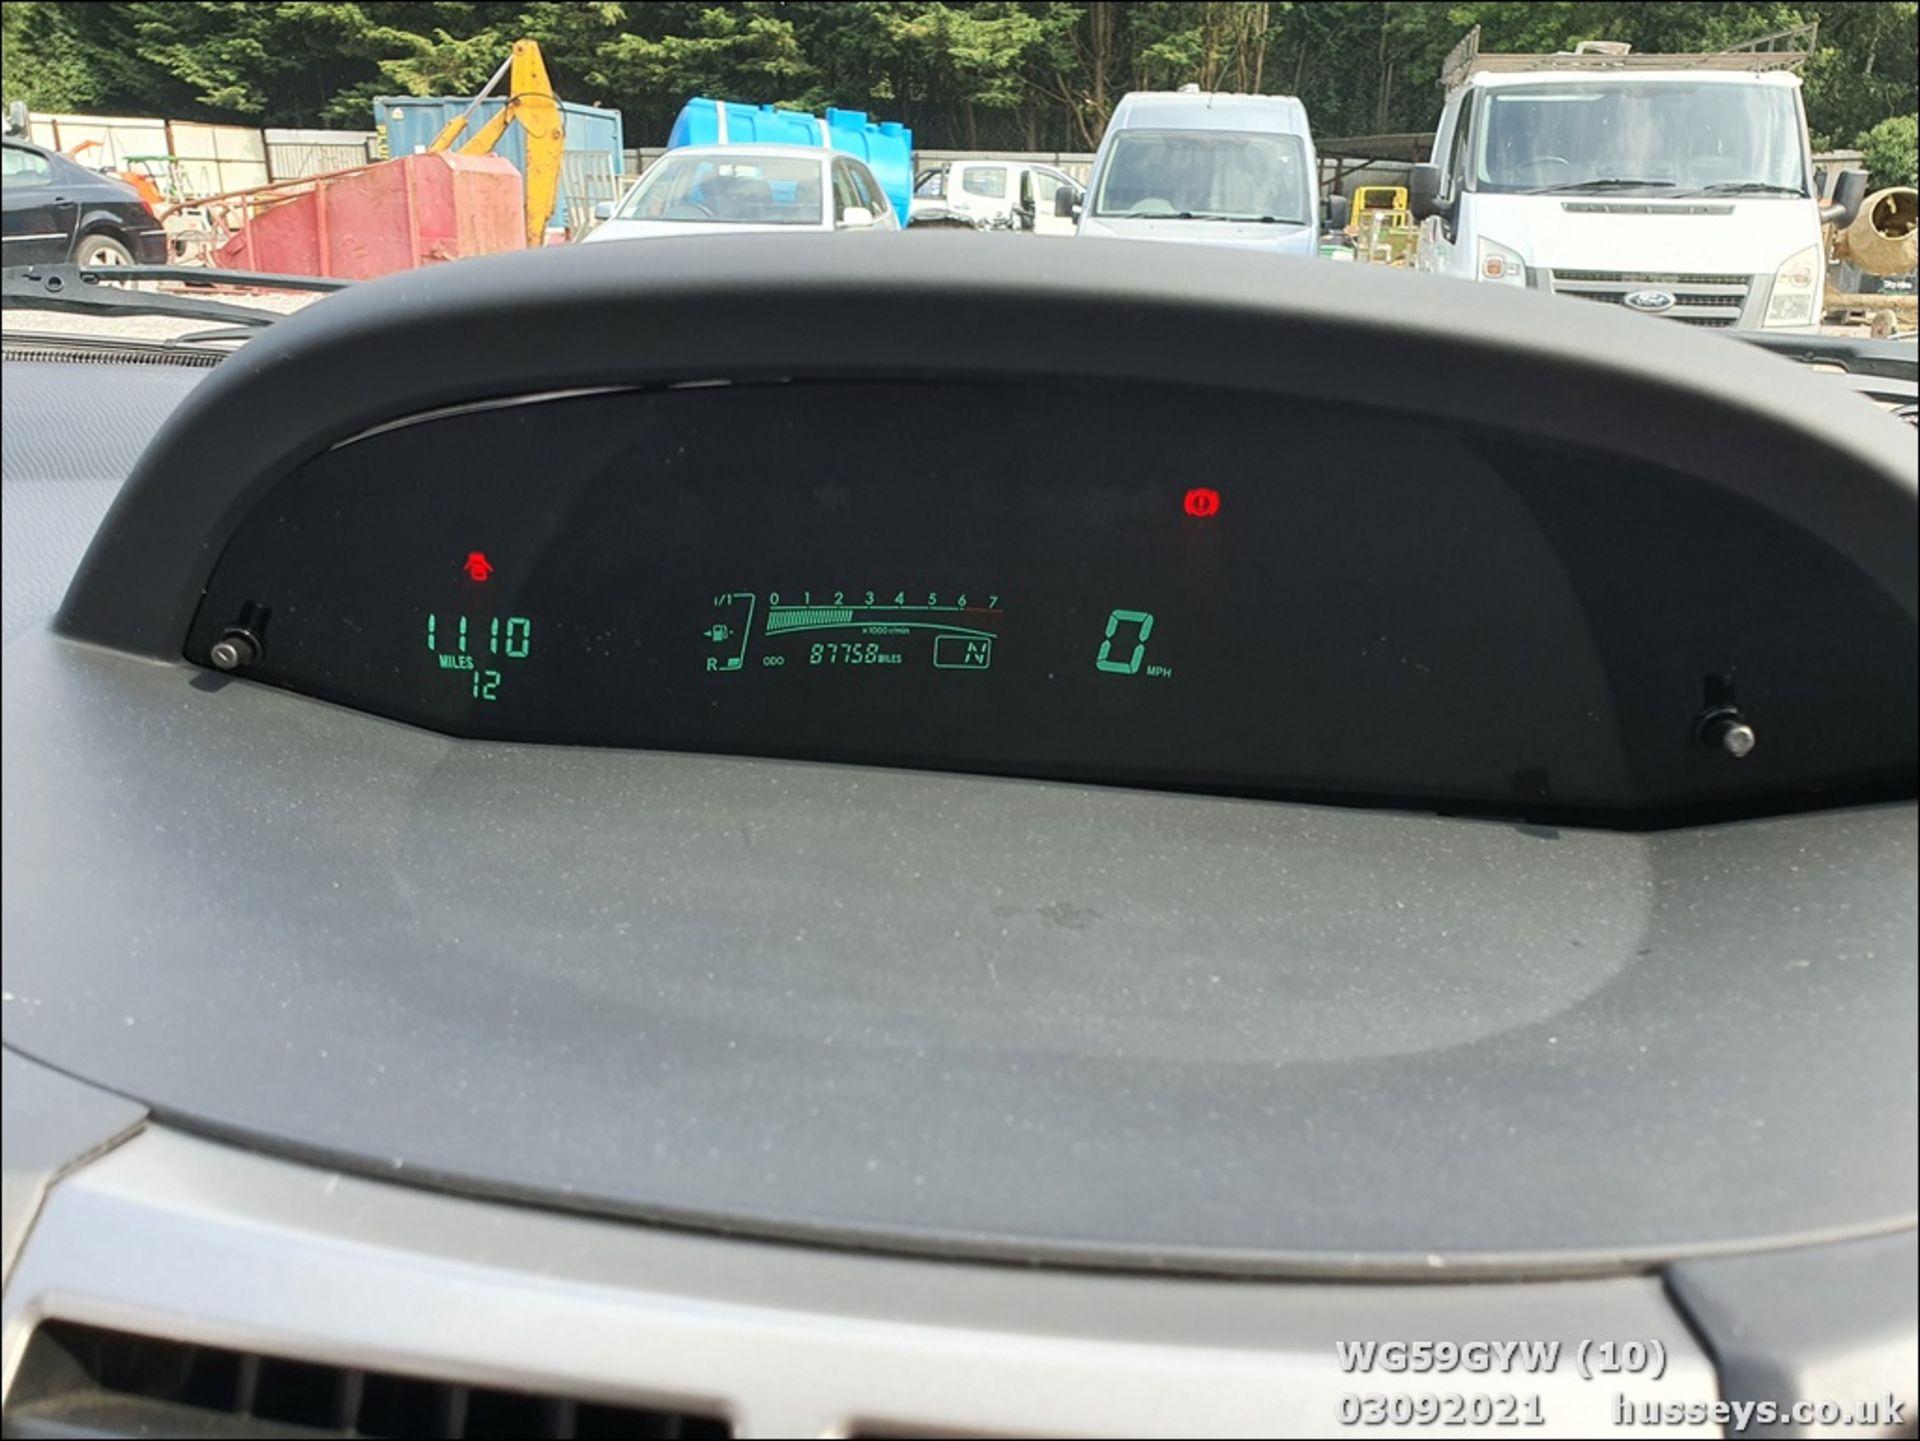 09/59 TOYOTA YARIS TR VVT-I S-A - 1329cc 5dr Hatchback (Silver, 87k) - Image 10 of 12